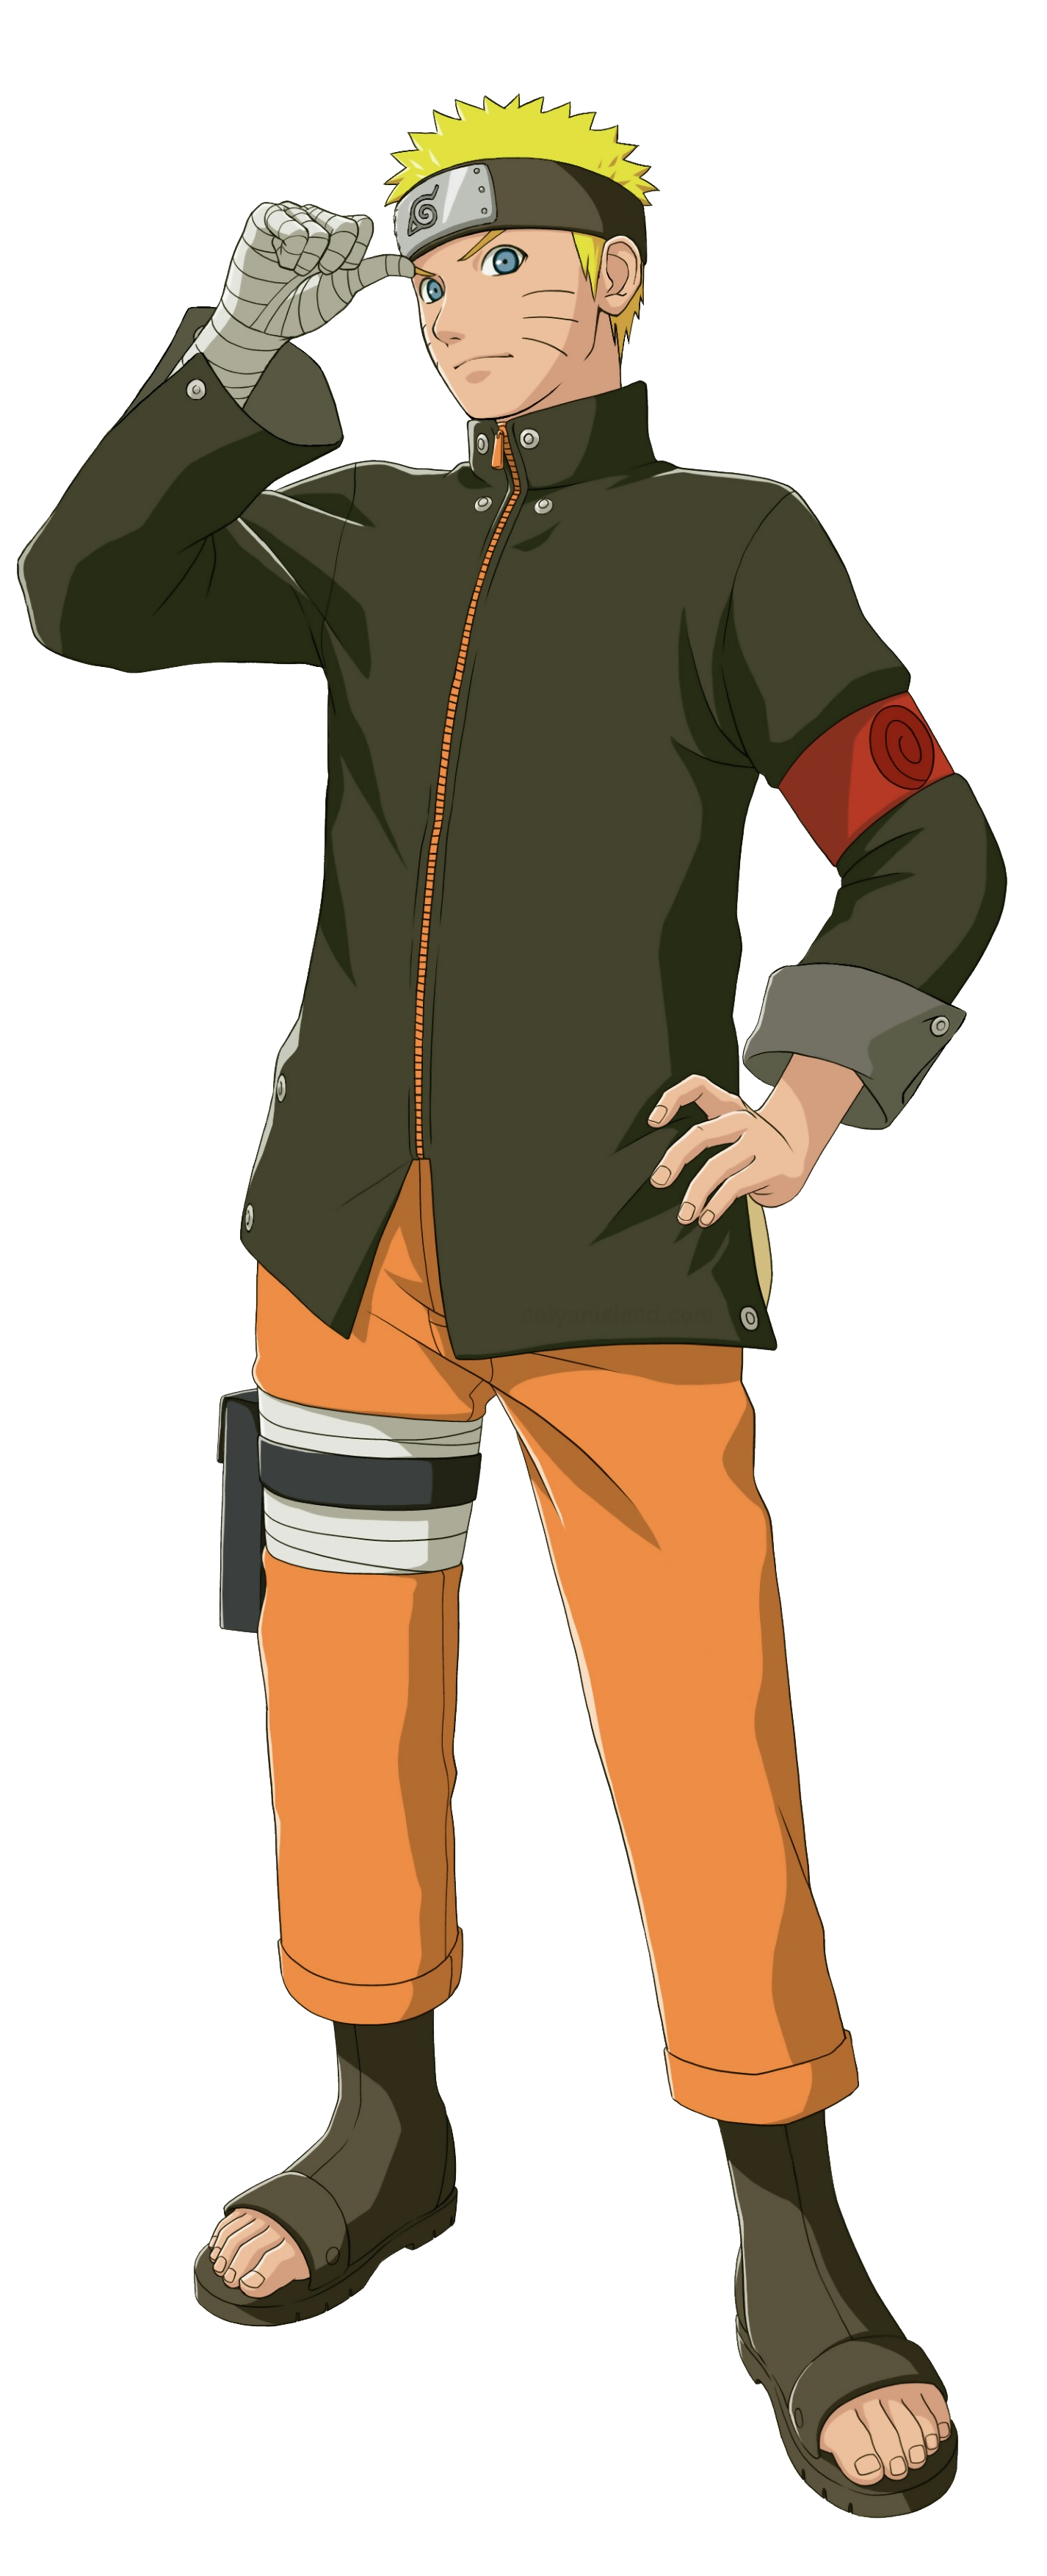 Verge Break; The Missing Link Naruto_-_The_Last